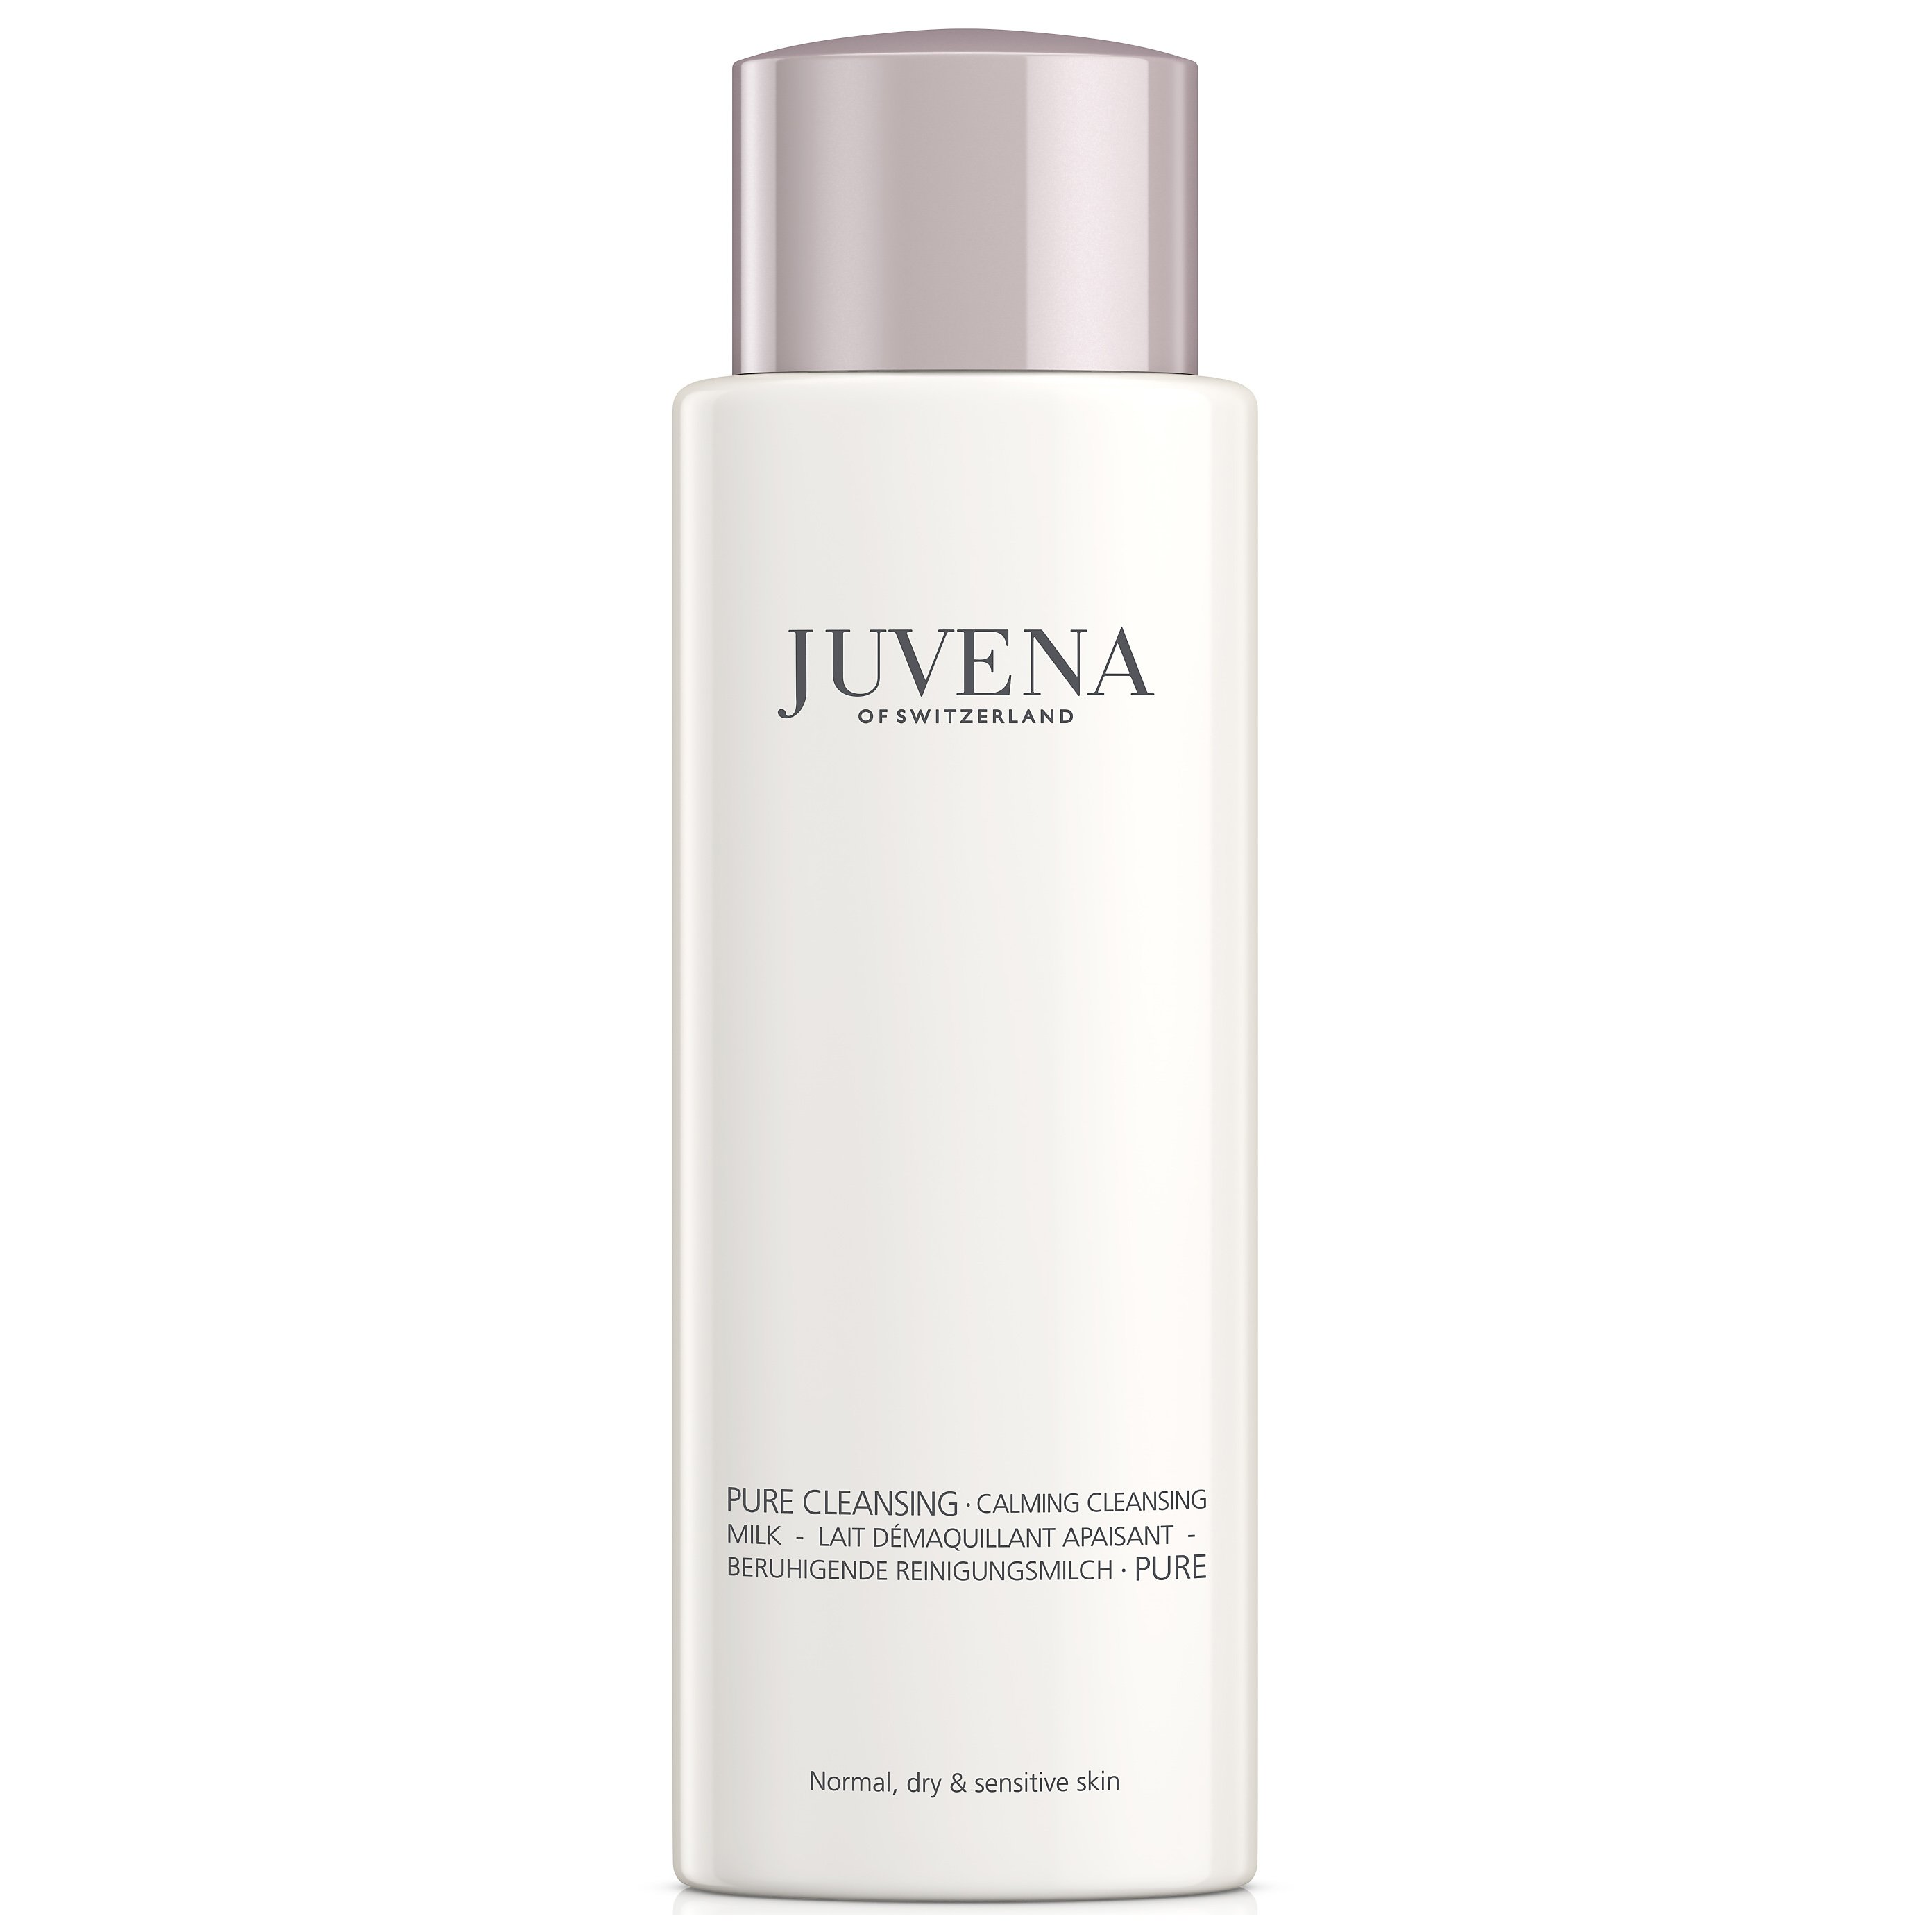 Juvena Pure Cleansing Calming Cleansing Milk Καταπραϋντικό Γαλάκτωμα Καθαρισμού για Κανονικές Ξηρές Ευαίσθητες Επιδερμίδες 200ml